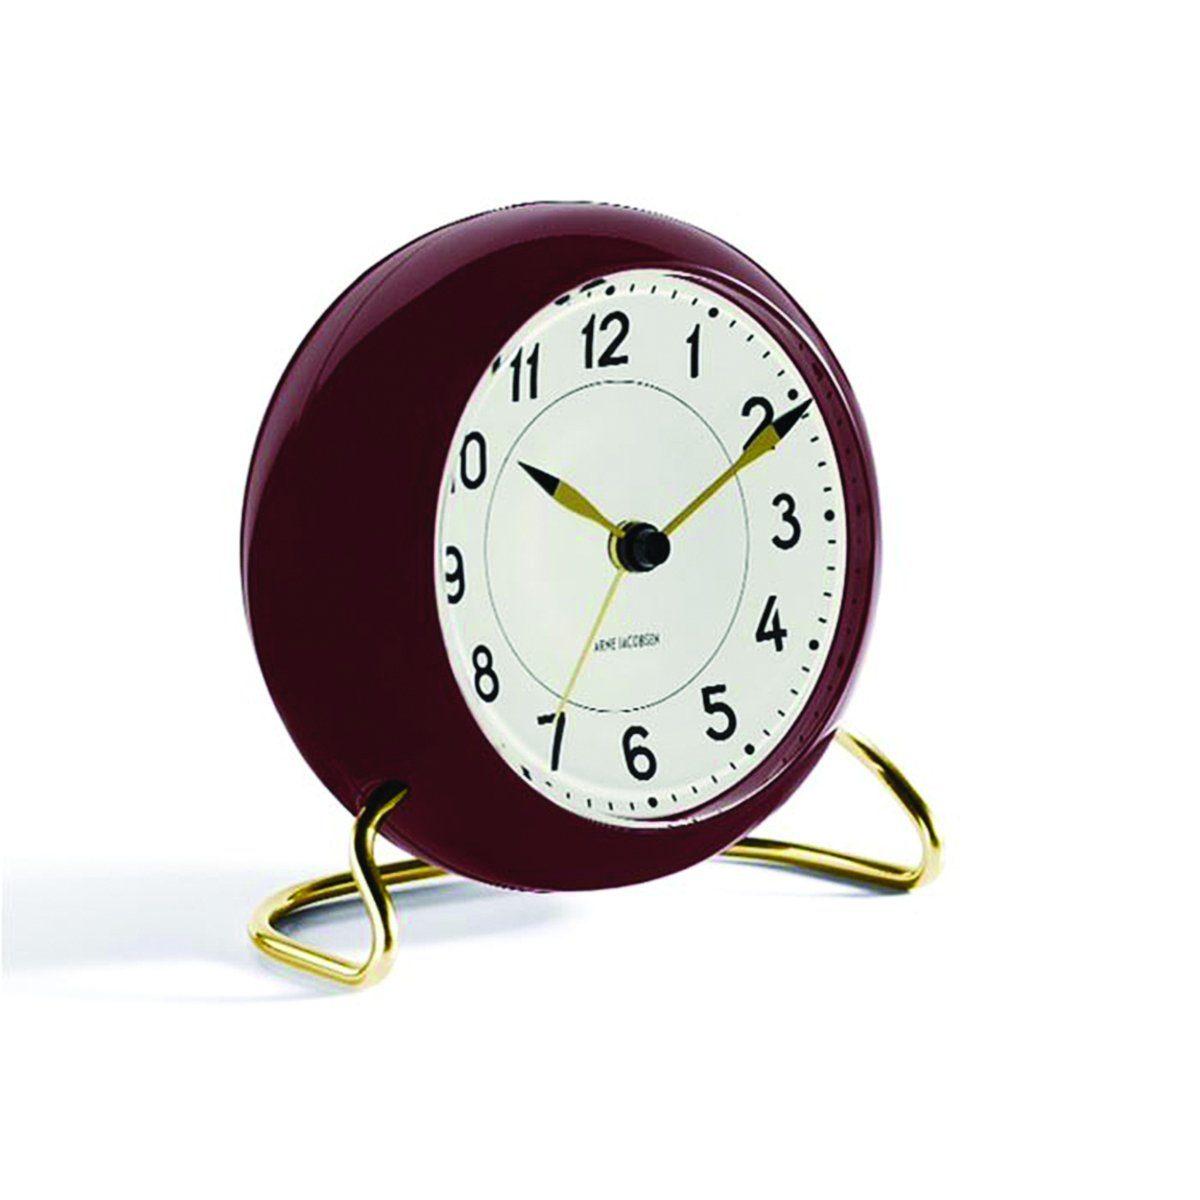 Rosendahl Rosendahl Tischuhr AJ Clock Station mit Alarm rotbraun gold